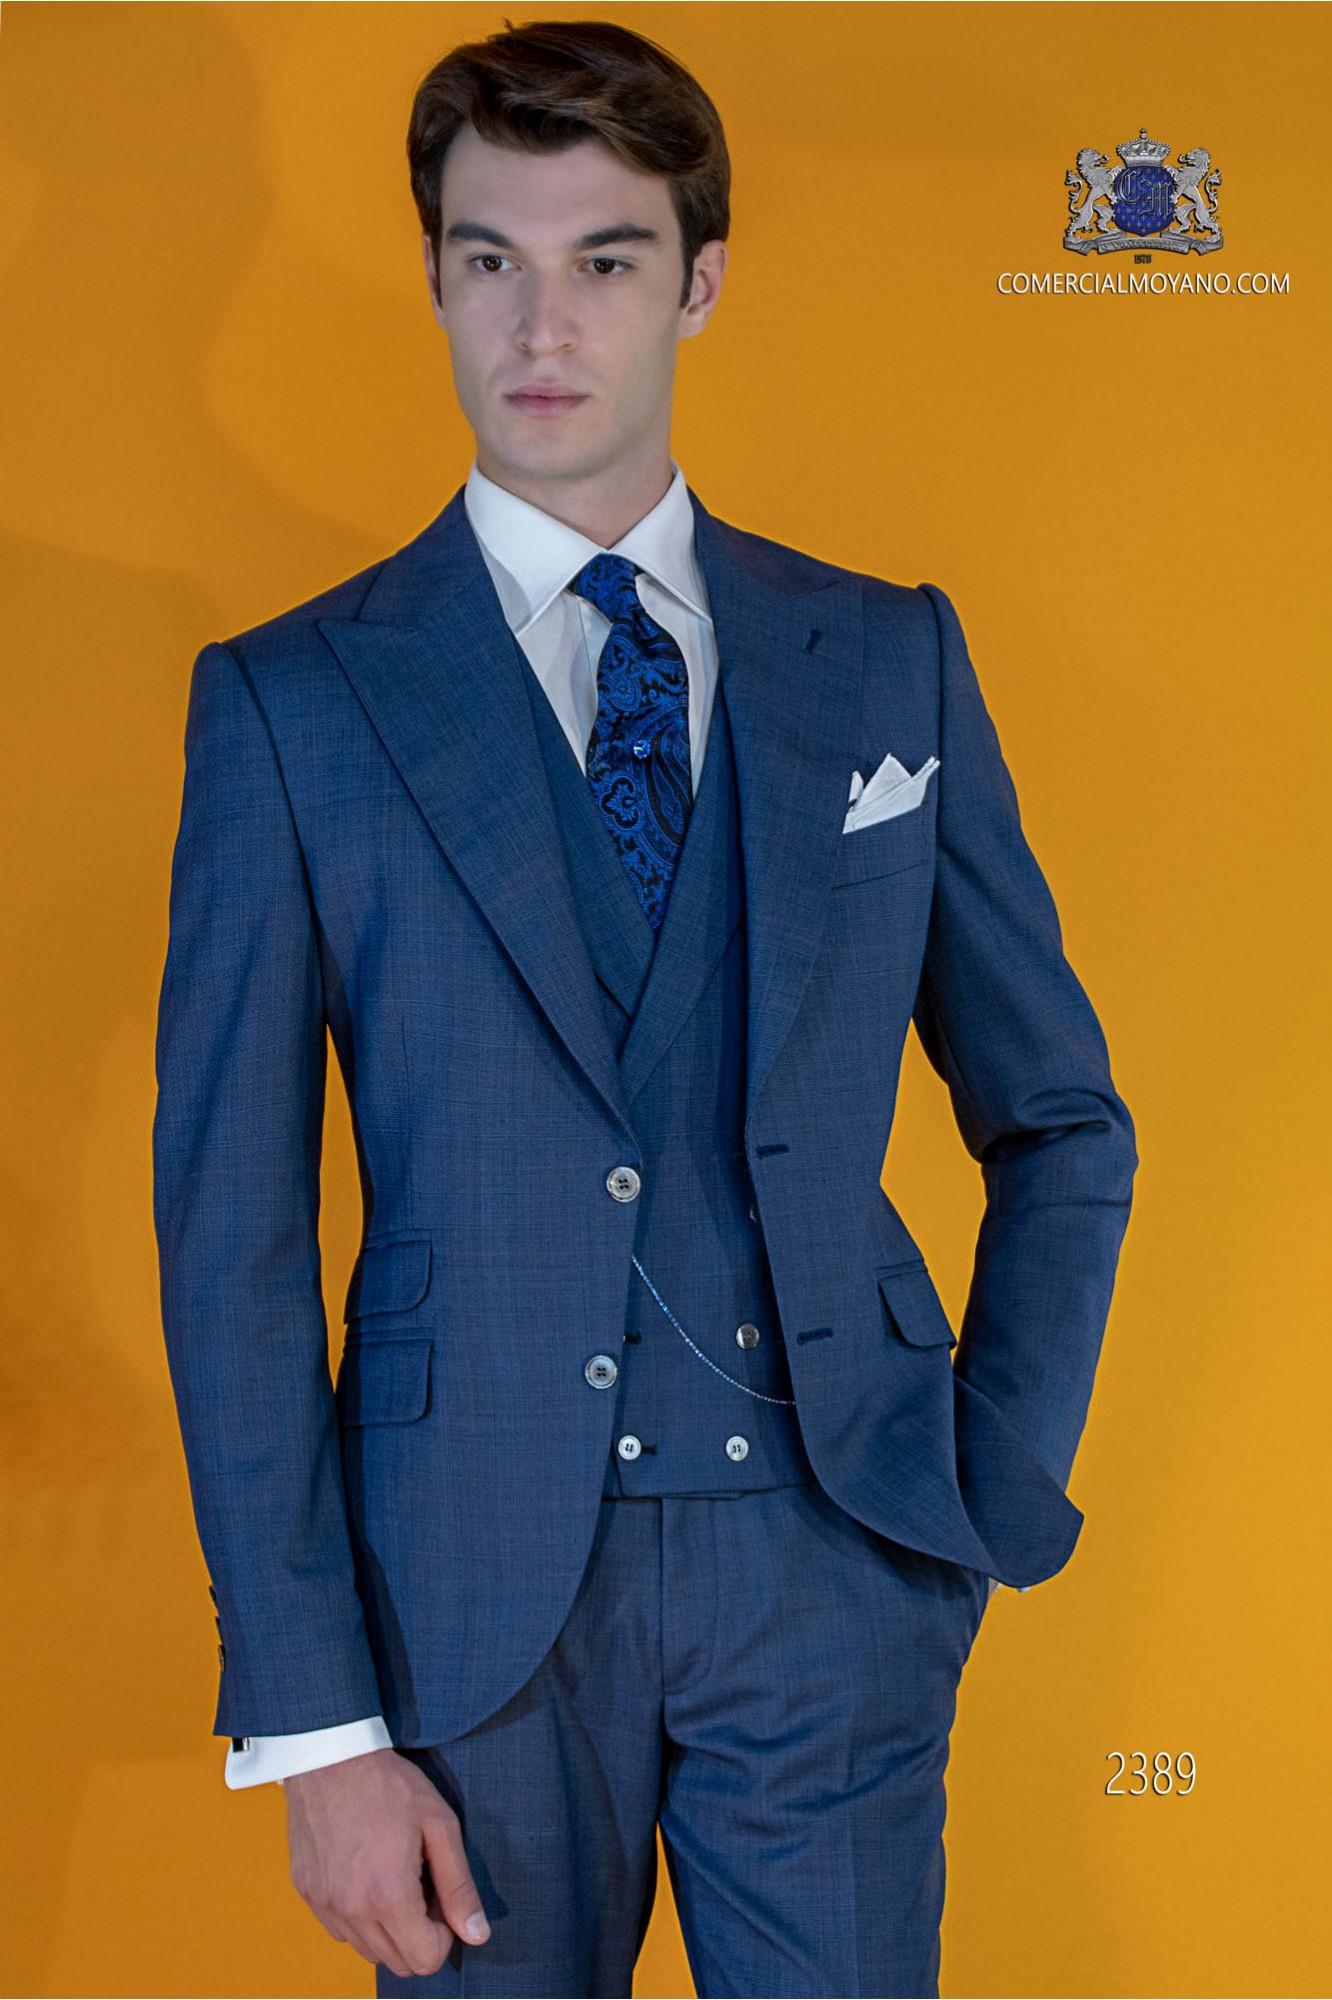 Bespoke Prince of Wales blue sui